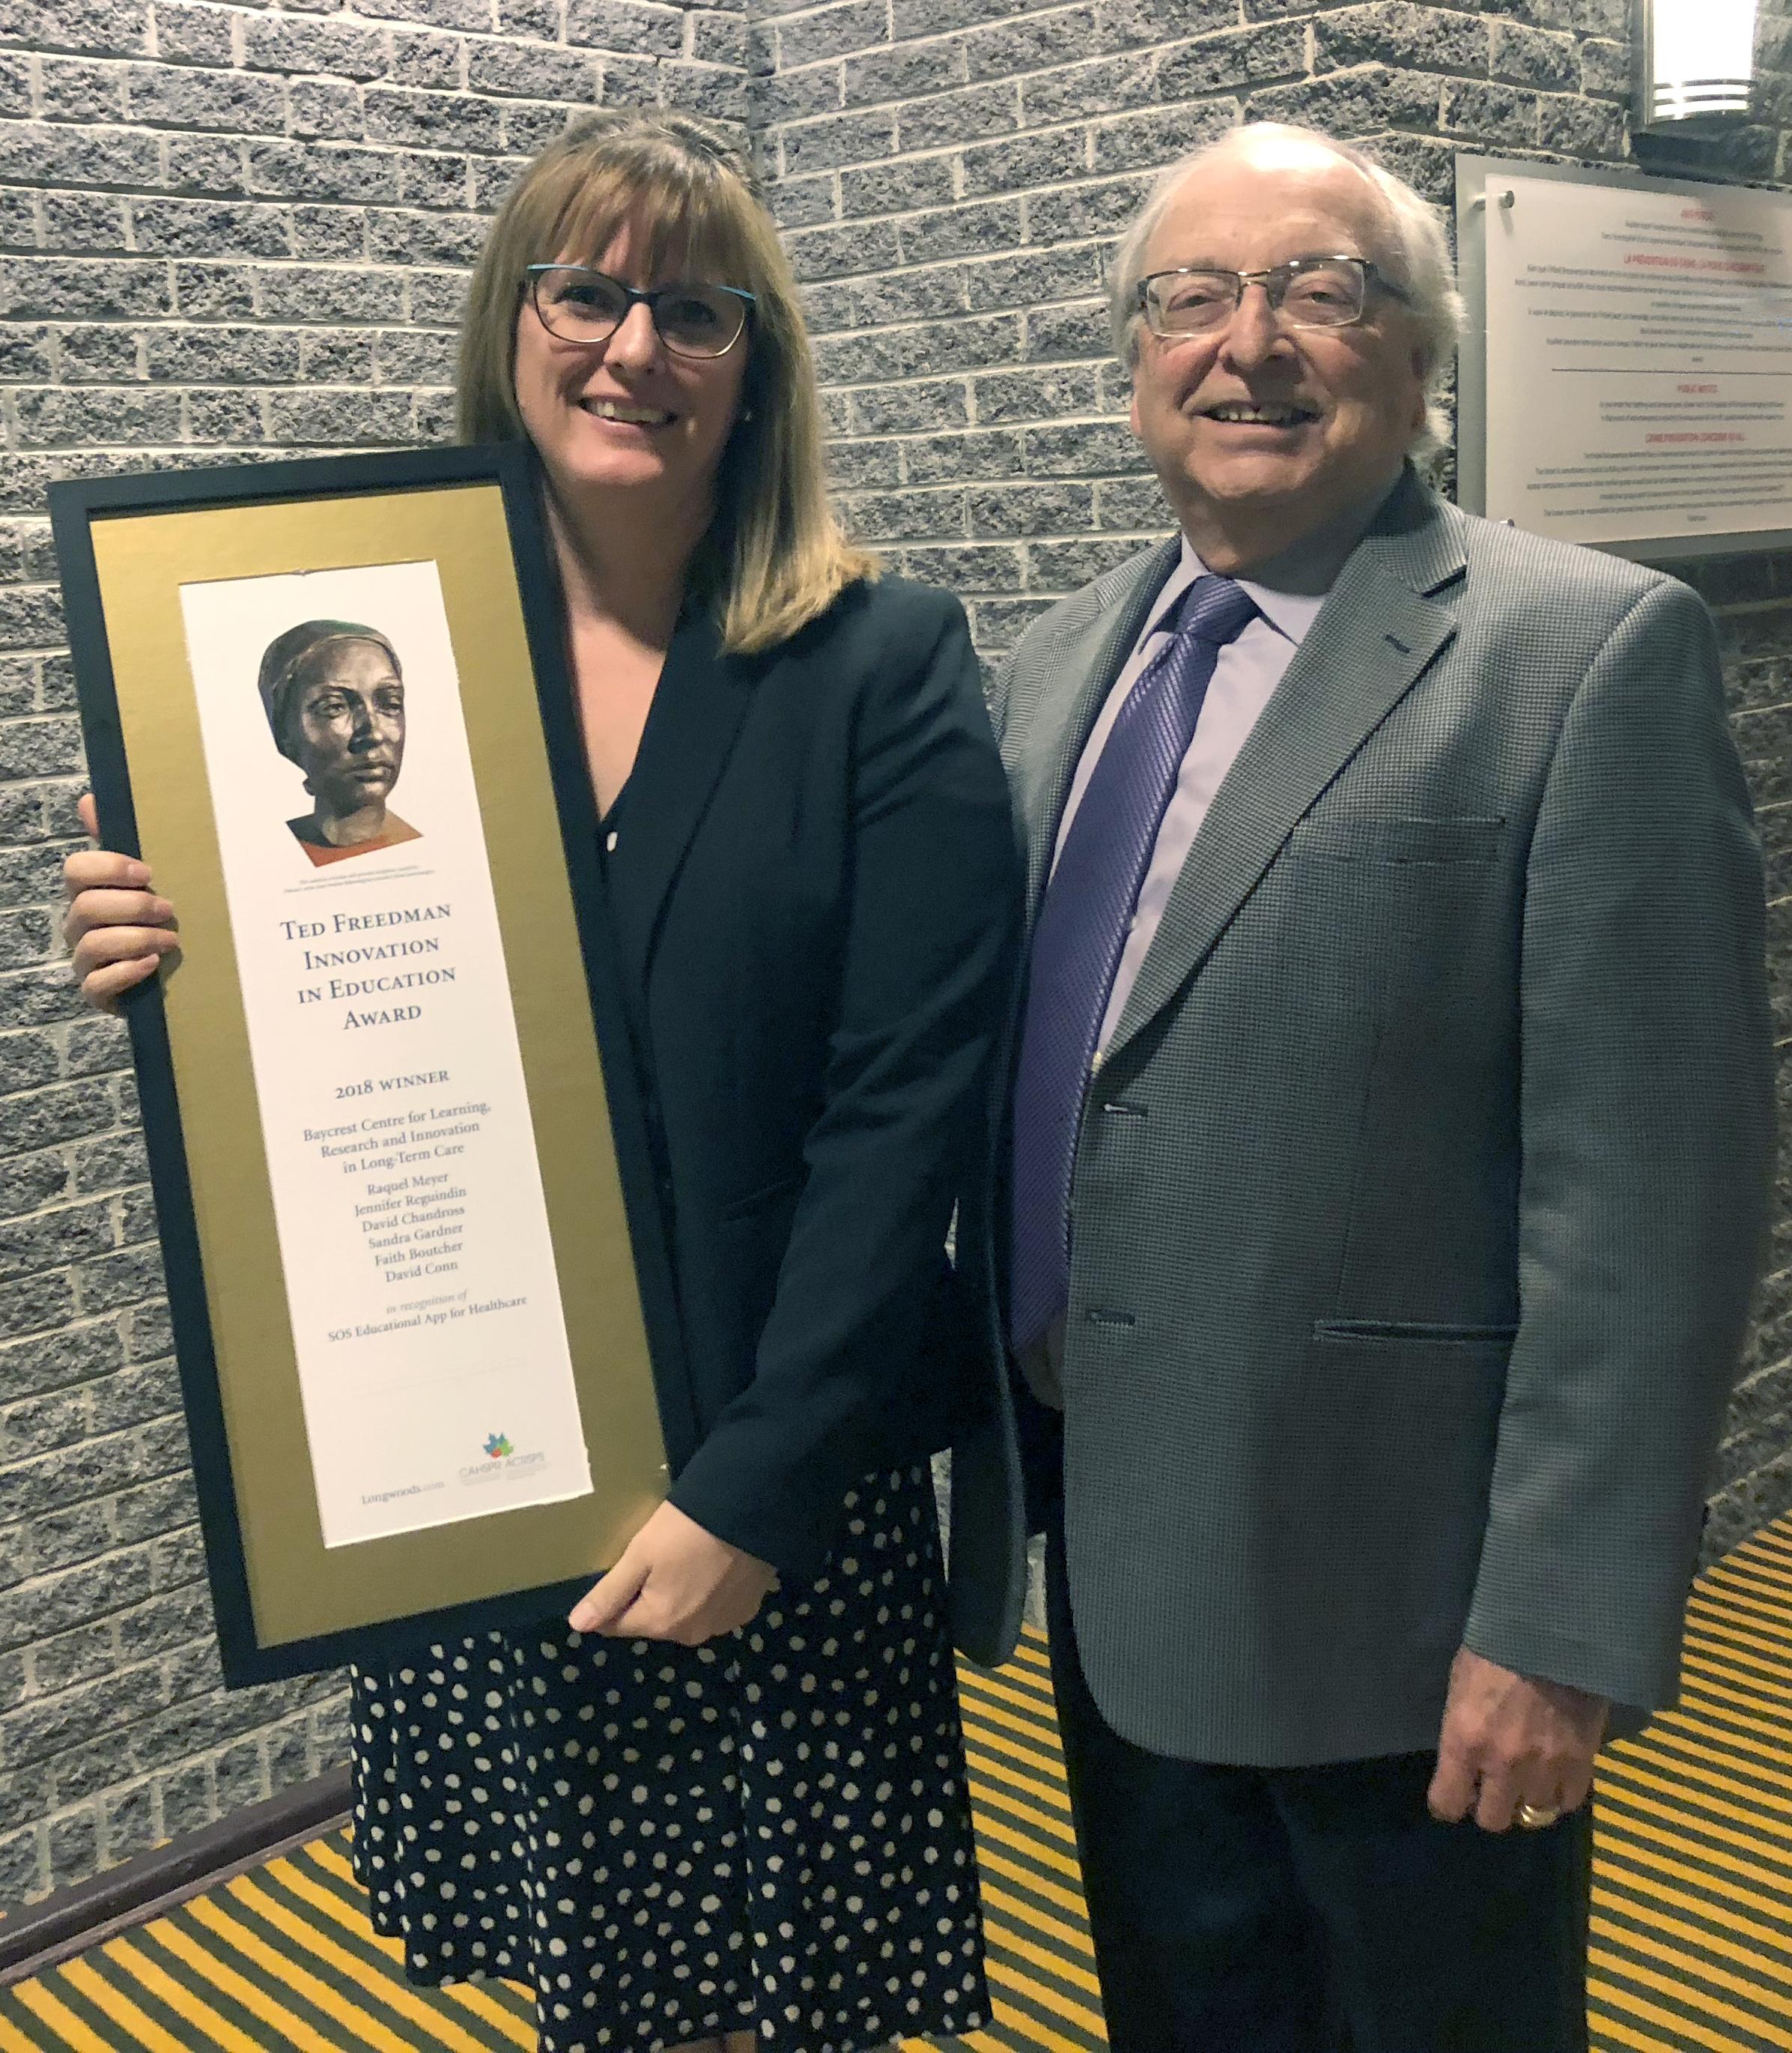 Ted Freedman Award 2018